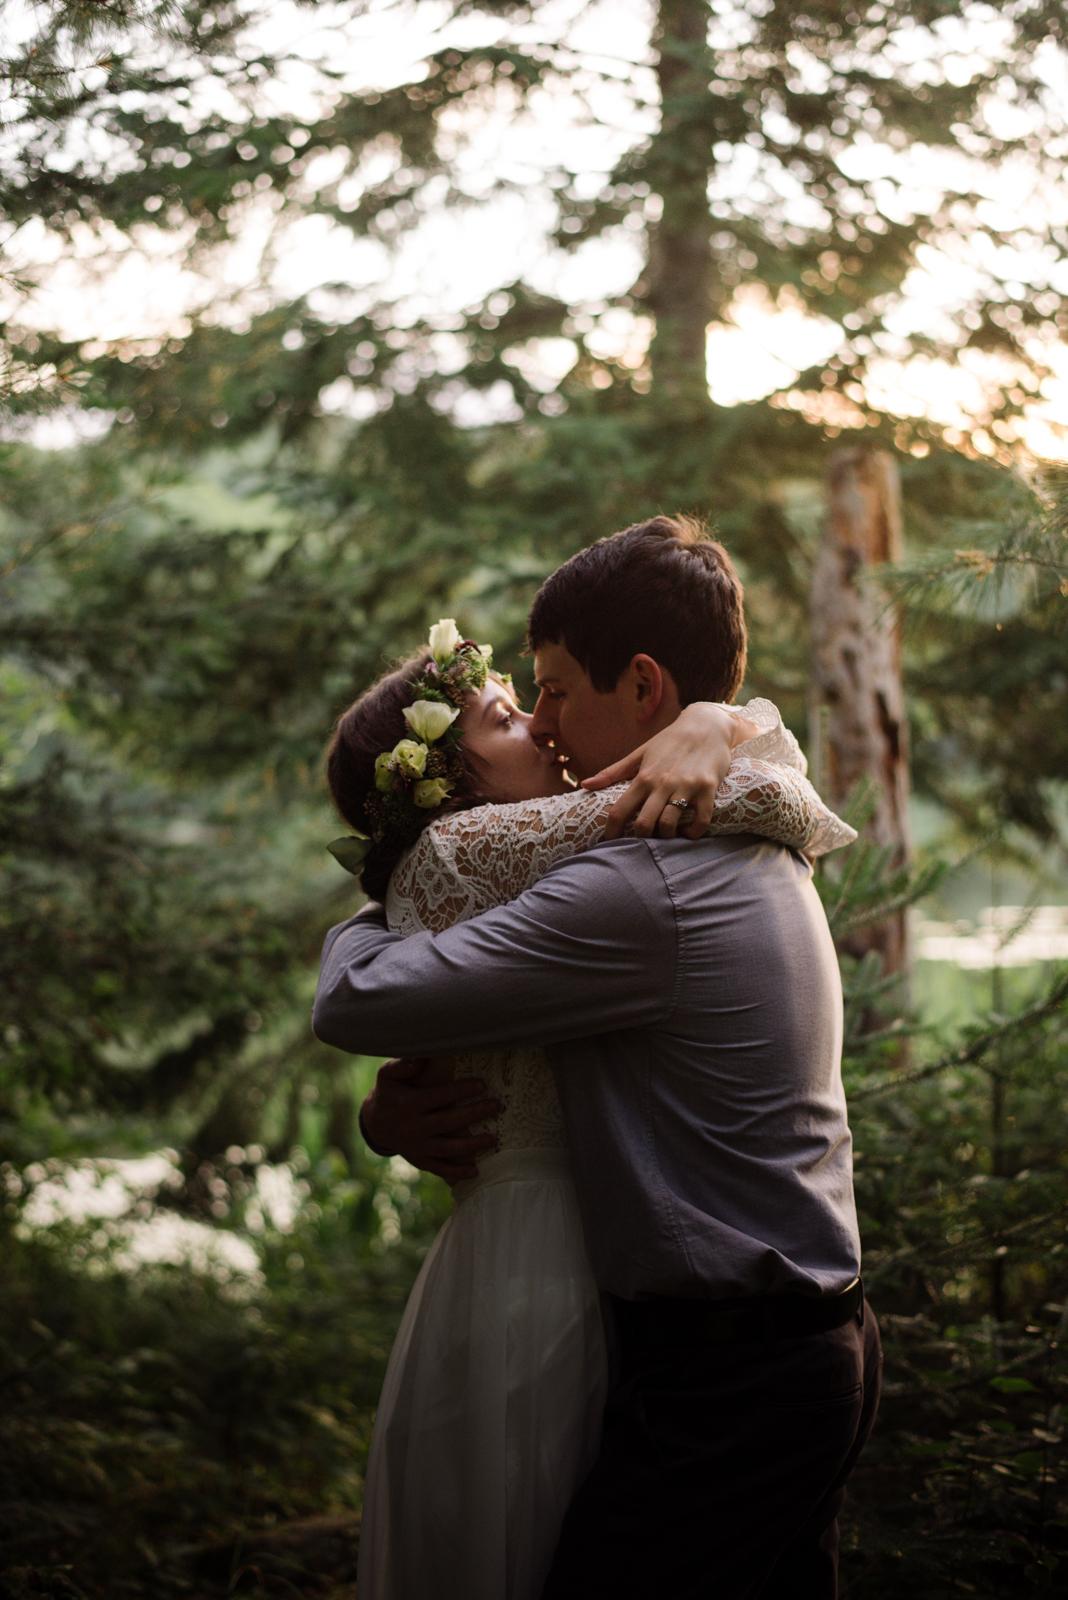 08192018-JessicaJordan-JuliaLuckettPhotography-268.jpg